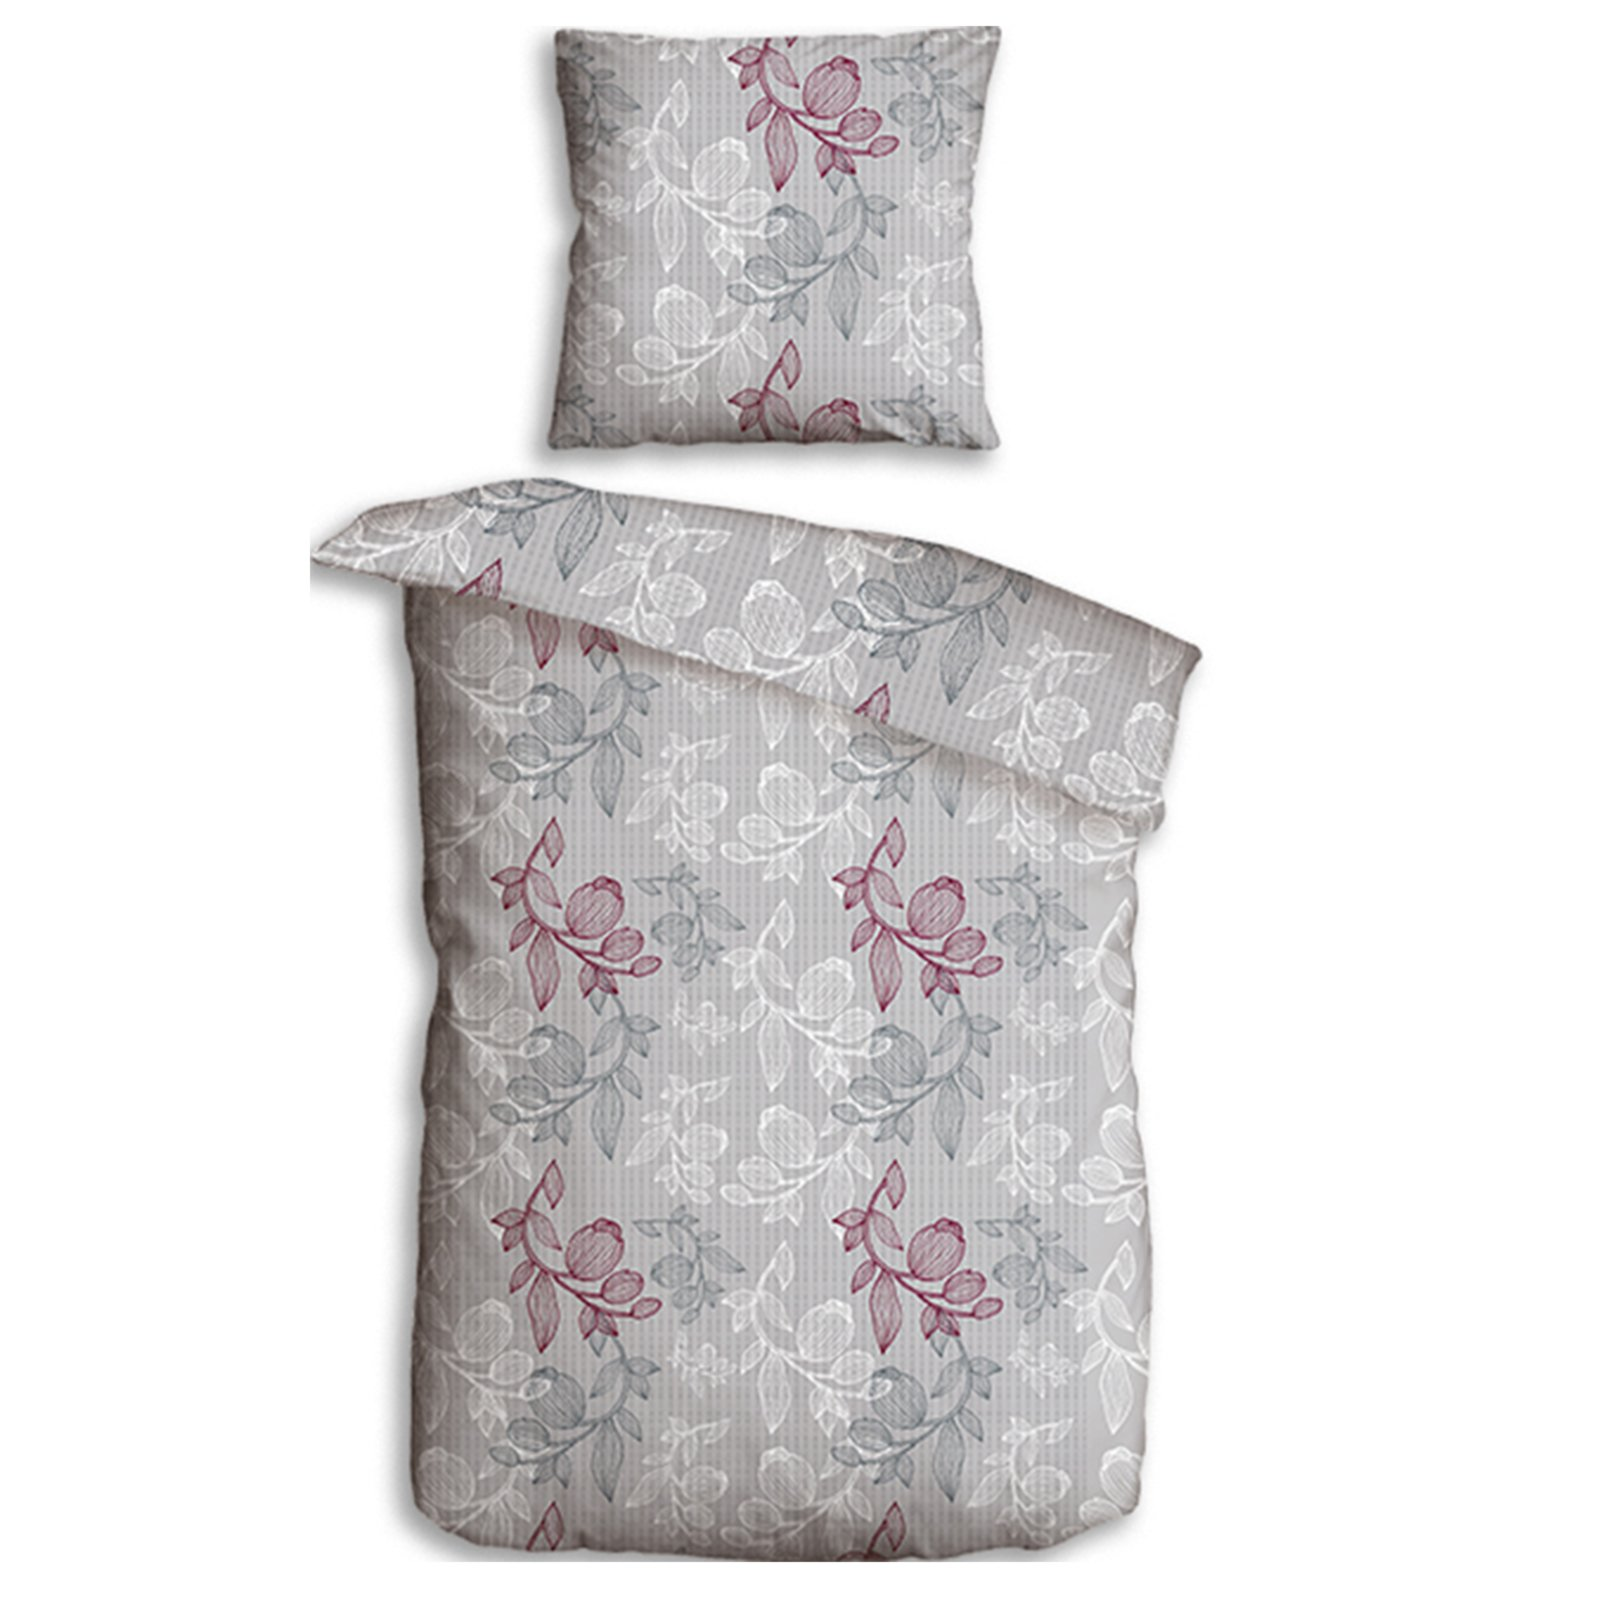 microfaser seersucker bettw sche blume 135x200 cm. Black Bedroom Furniture Sets. Home Design Ideas